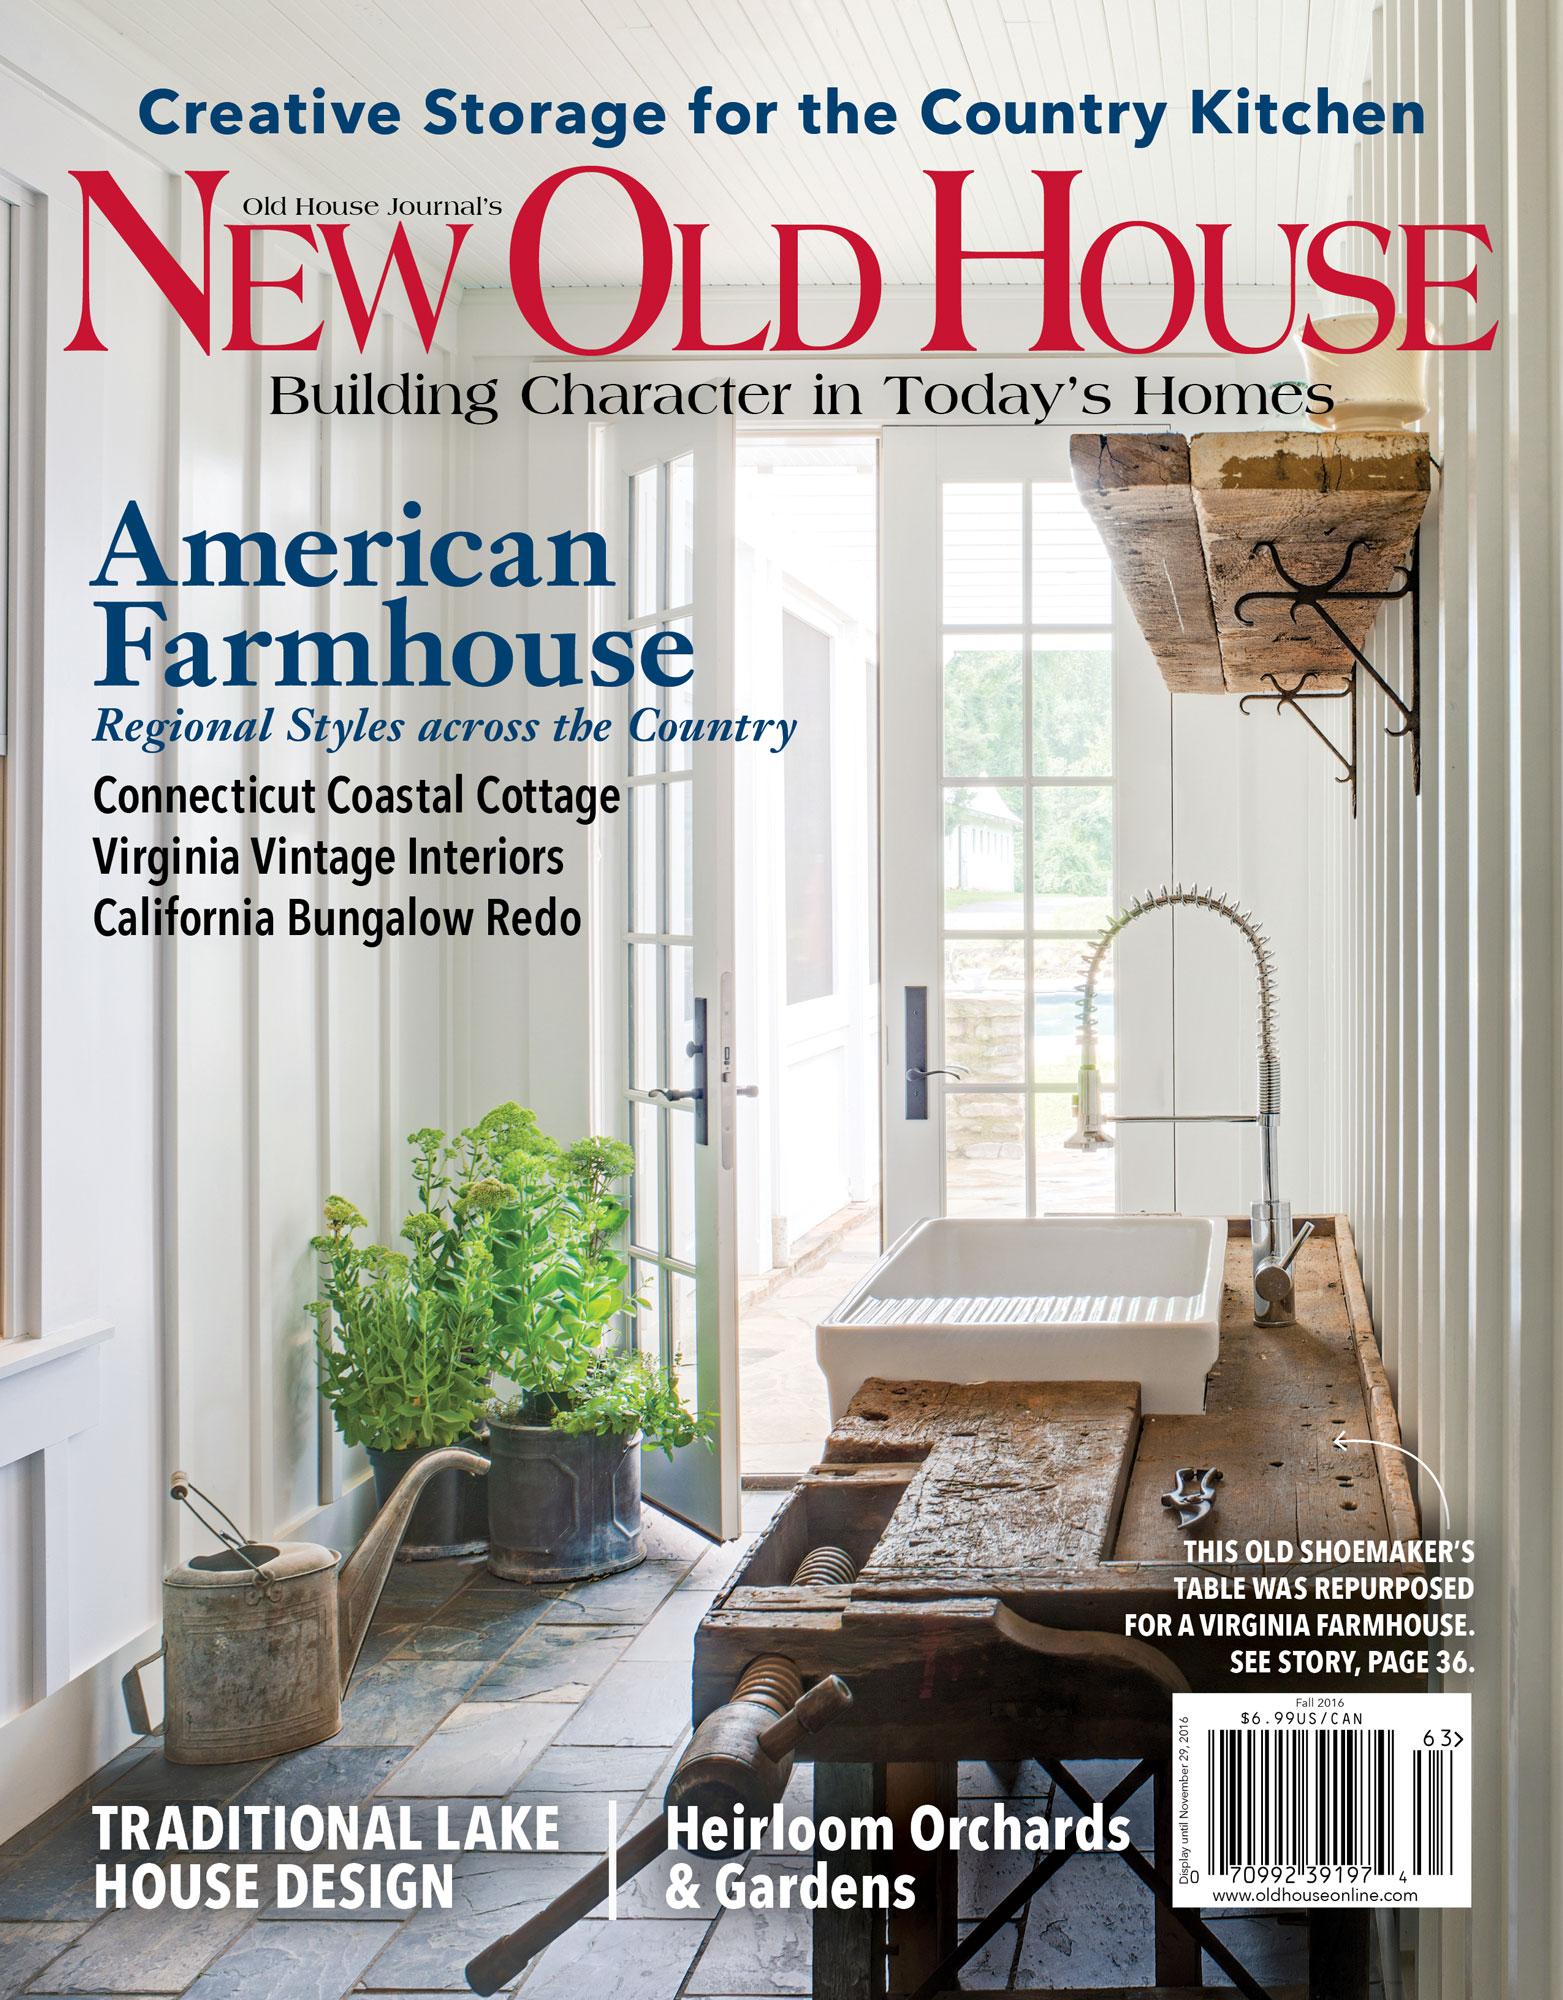 American Farmhouse by Megan Hillman